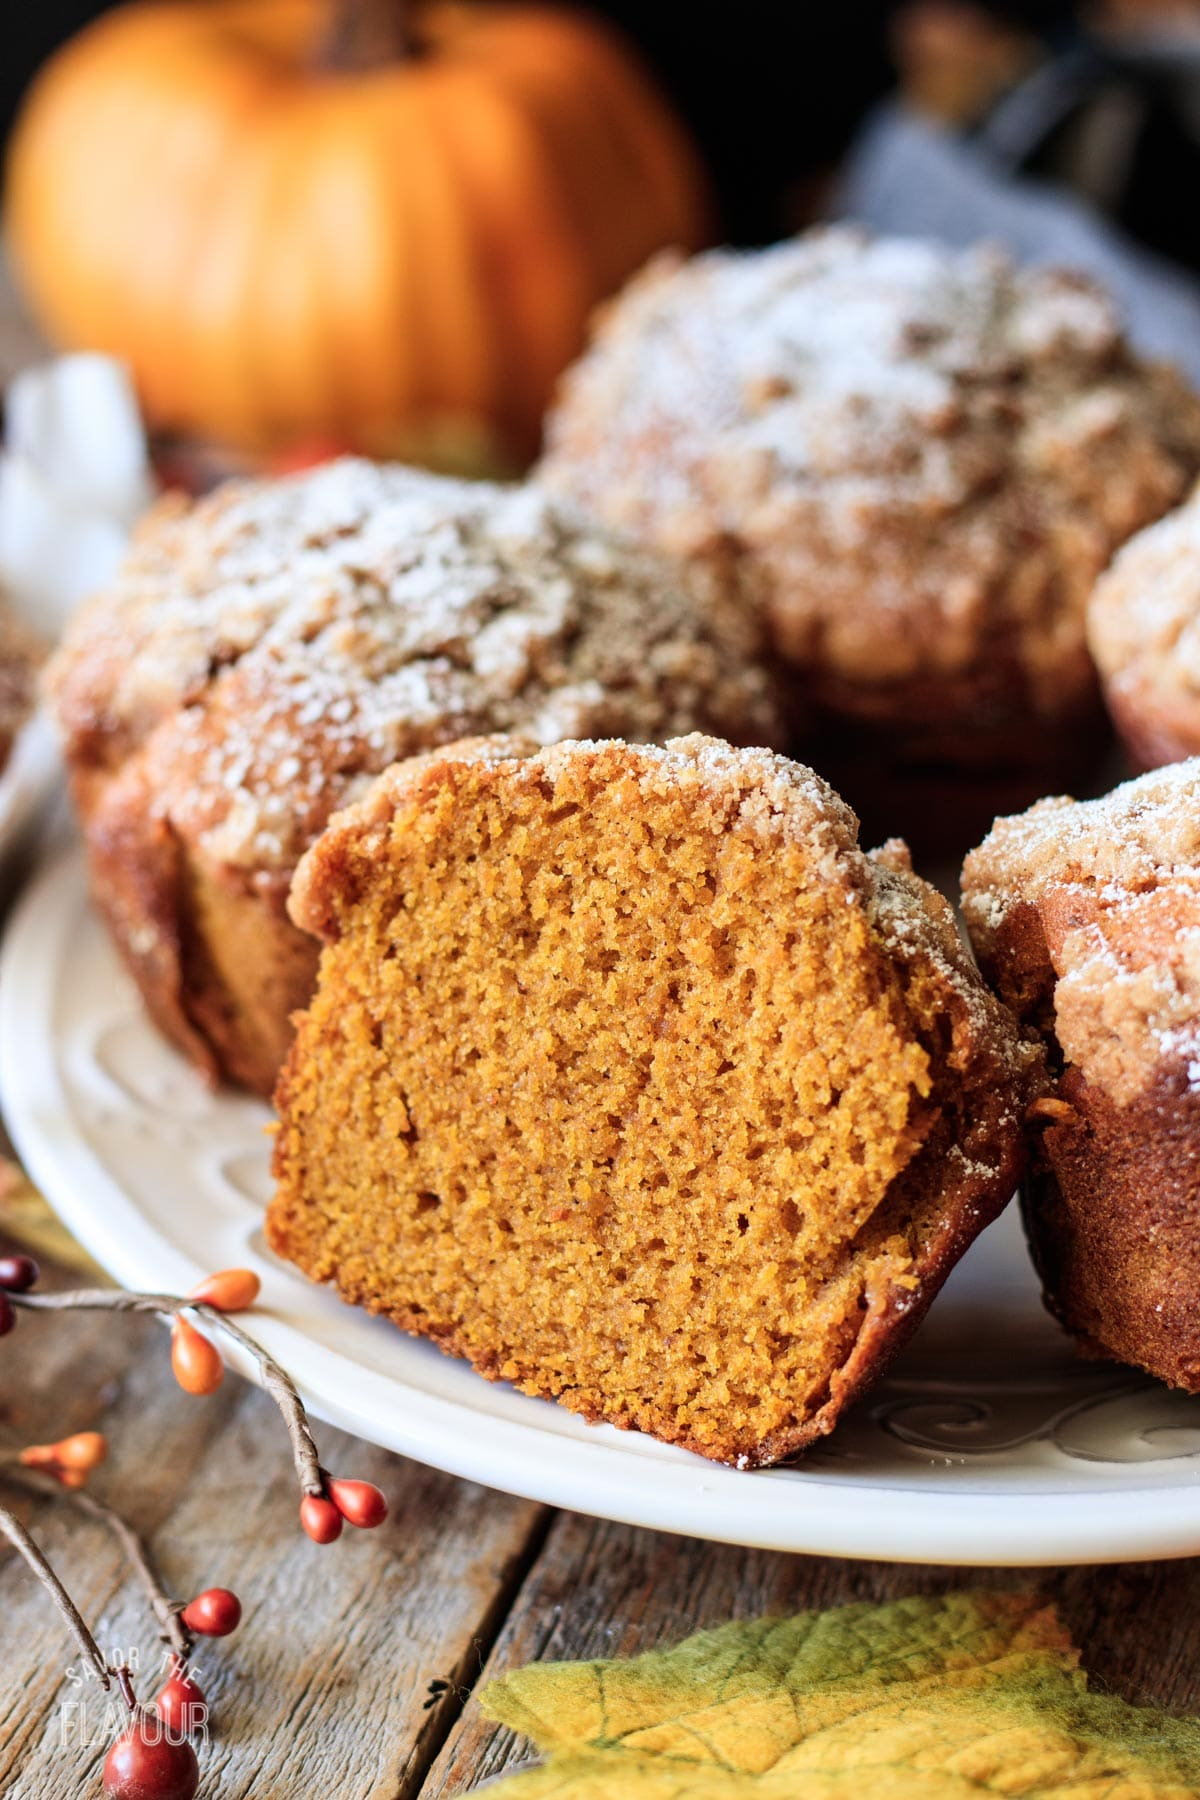 half of a Panera pumpkin muffin on a white plate